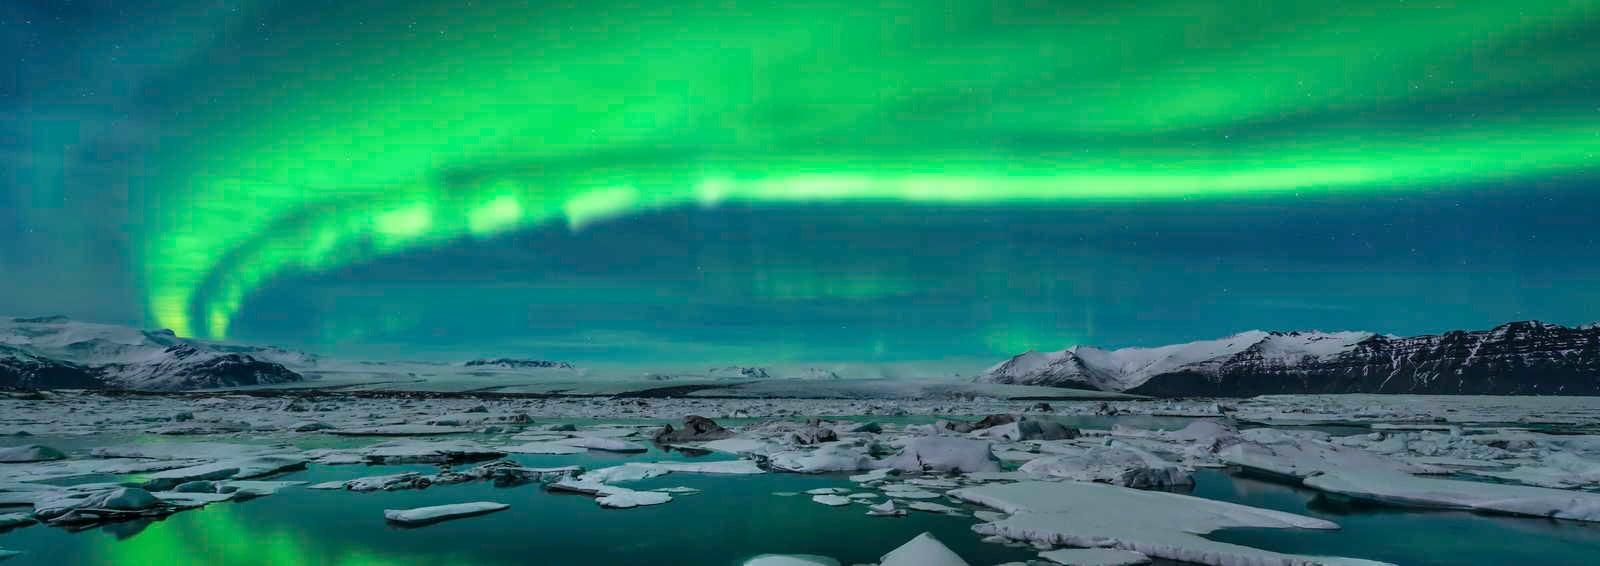 Northern Lights Iceland Northern Lights Holidays Iceland Northern